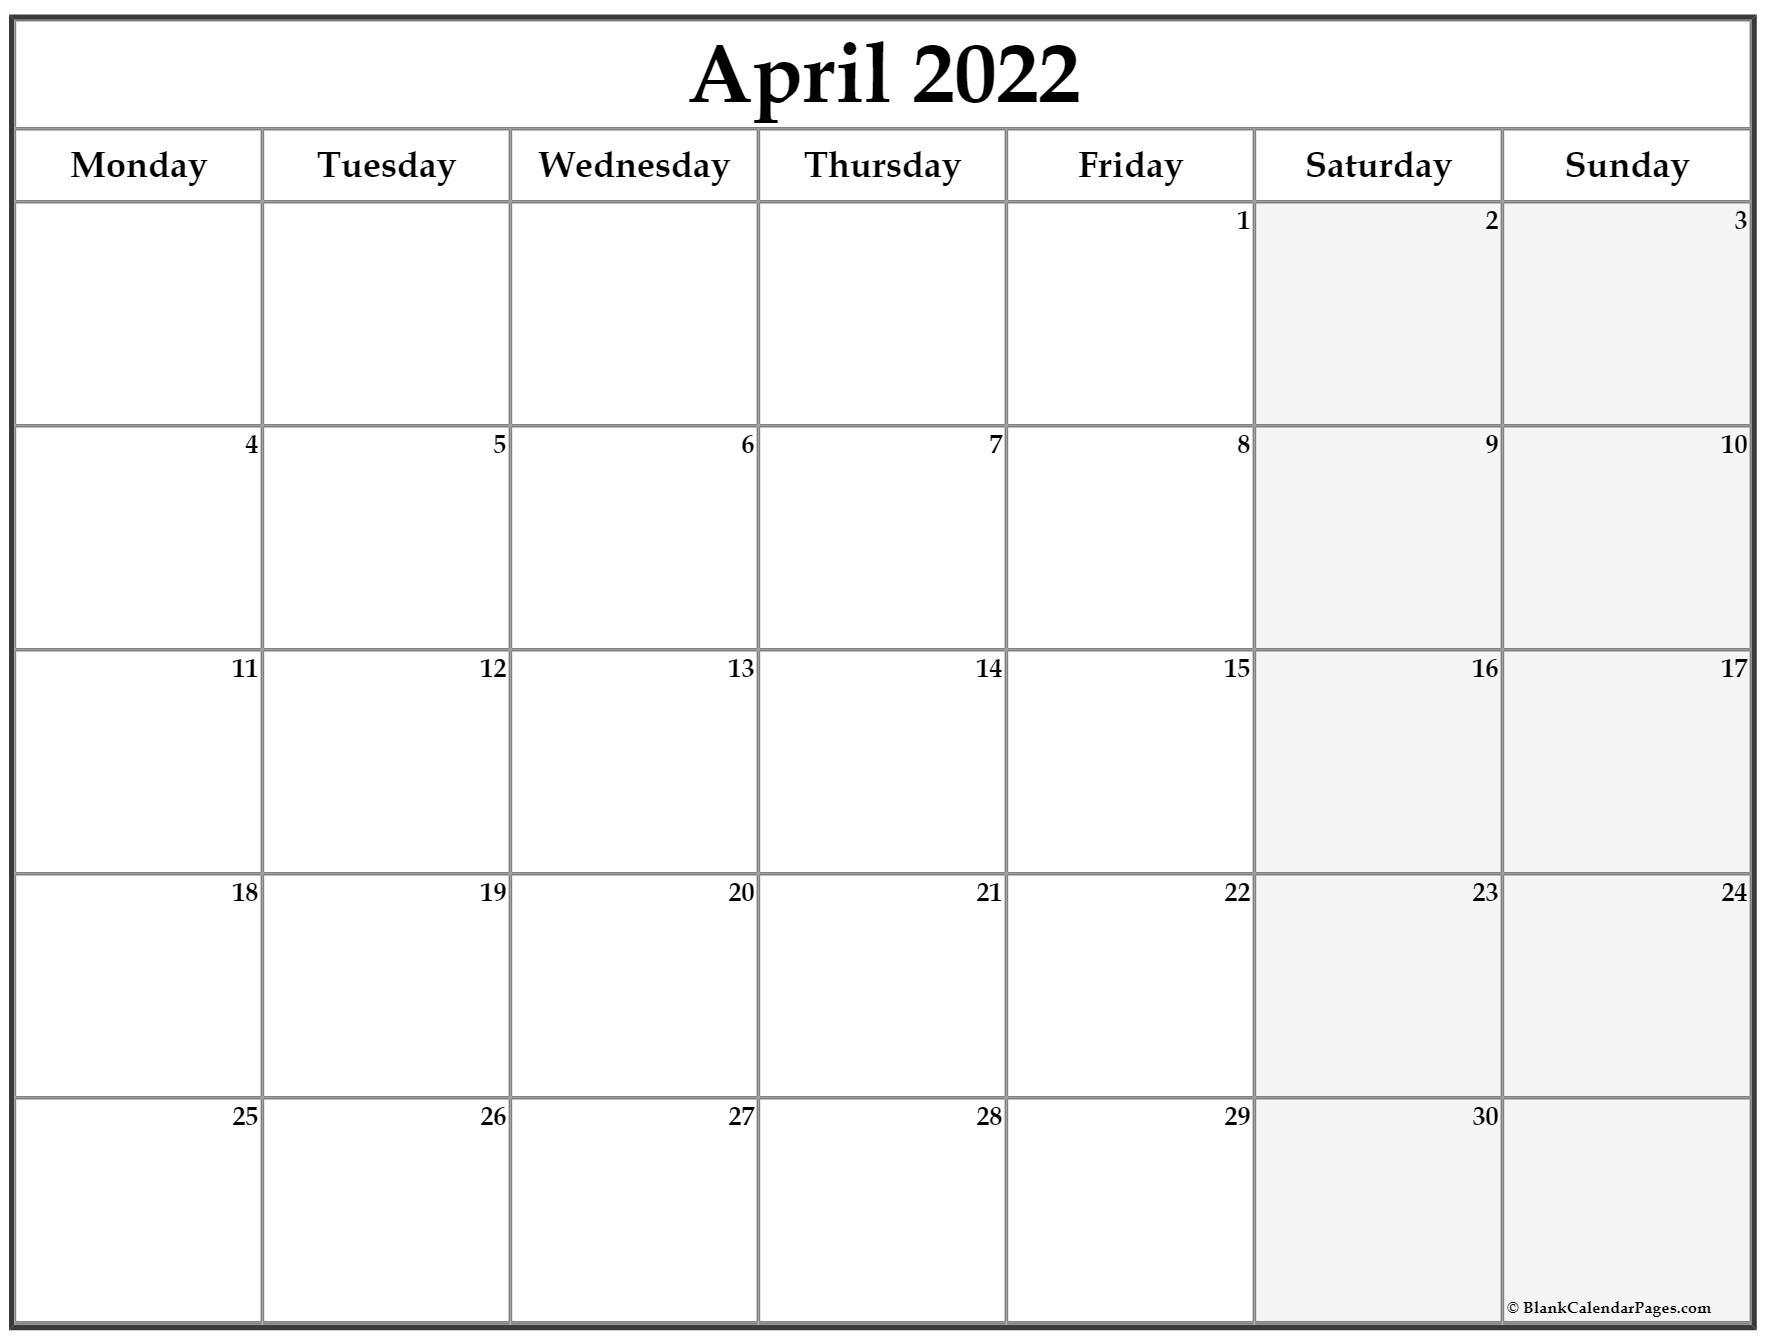 April 2022 Monday Calendar   Monday To Sunday inside Monday Through Sunday